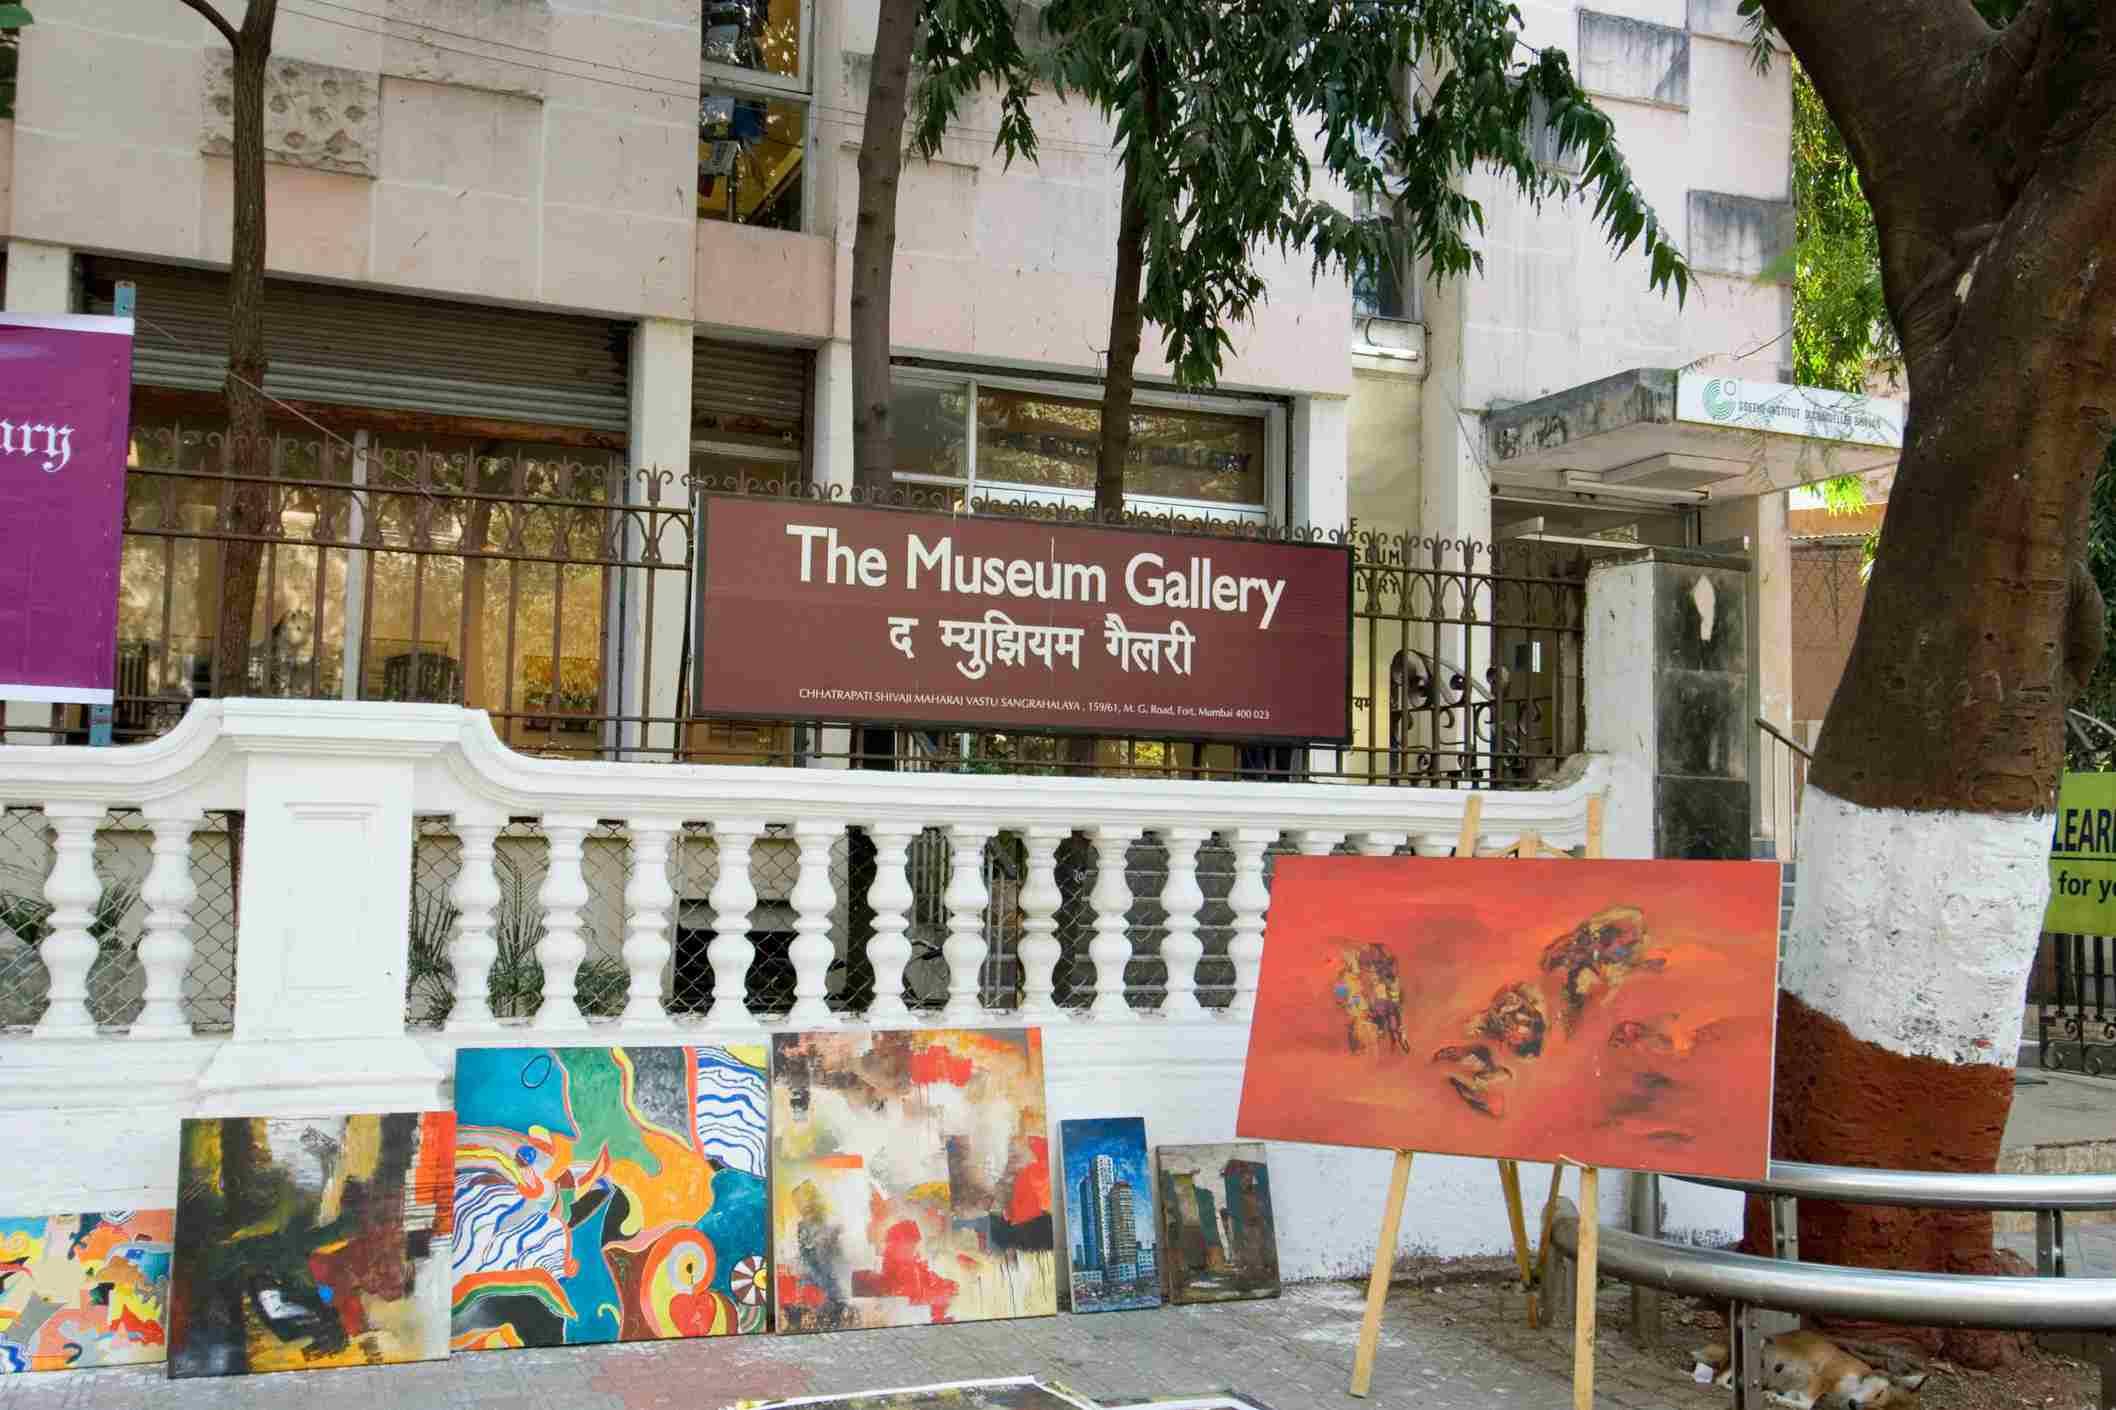 Museum Art Gallery in Kala Ghoda.